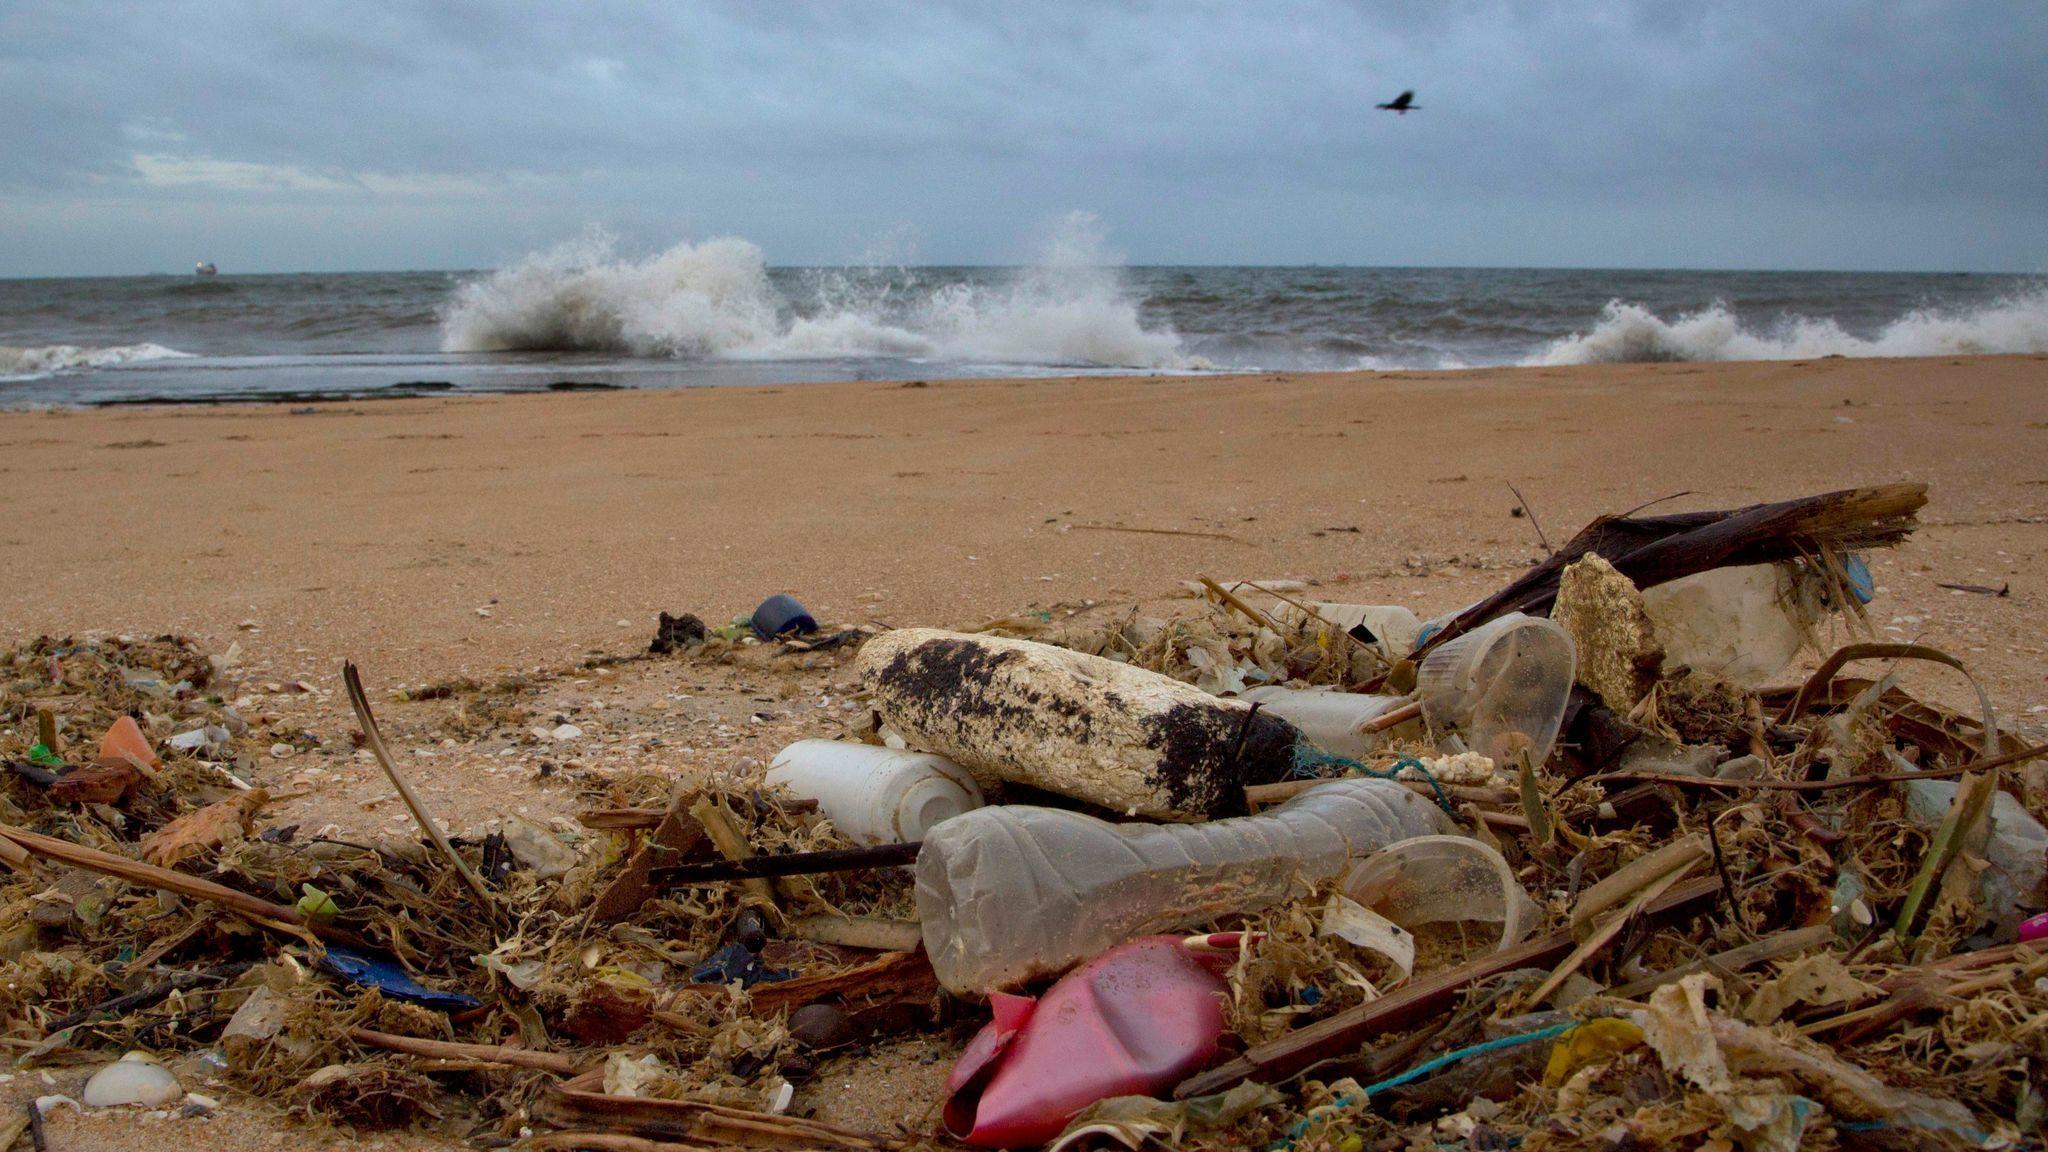 A plastic bottle lies among other debris washed ashore on an Indian Ocean beach in Uswetakeiyawa, Sri Lanka.